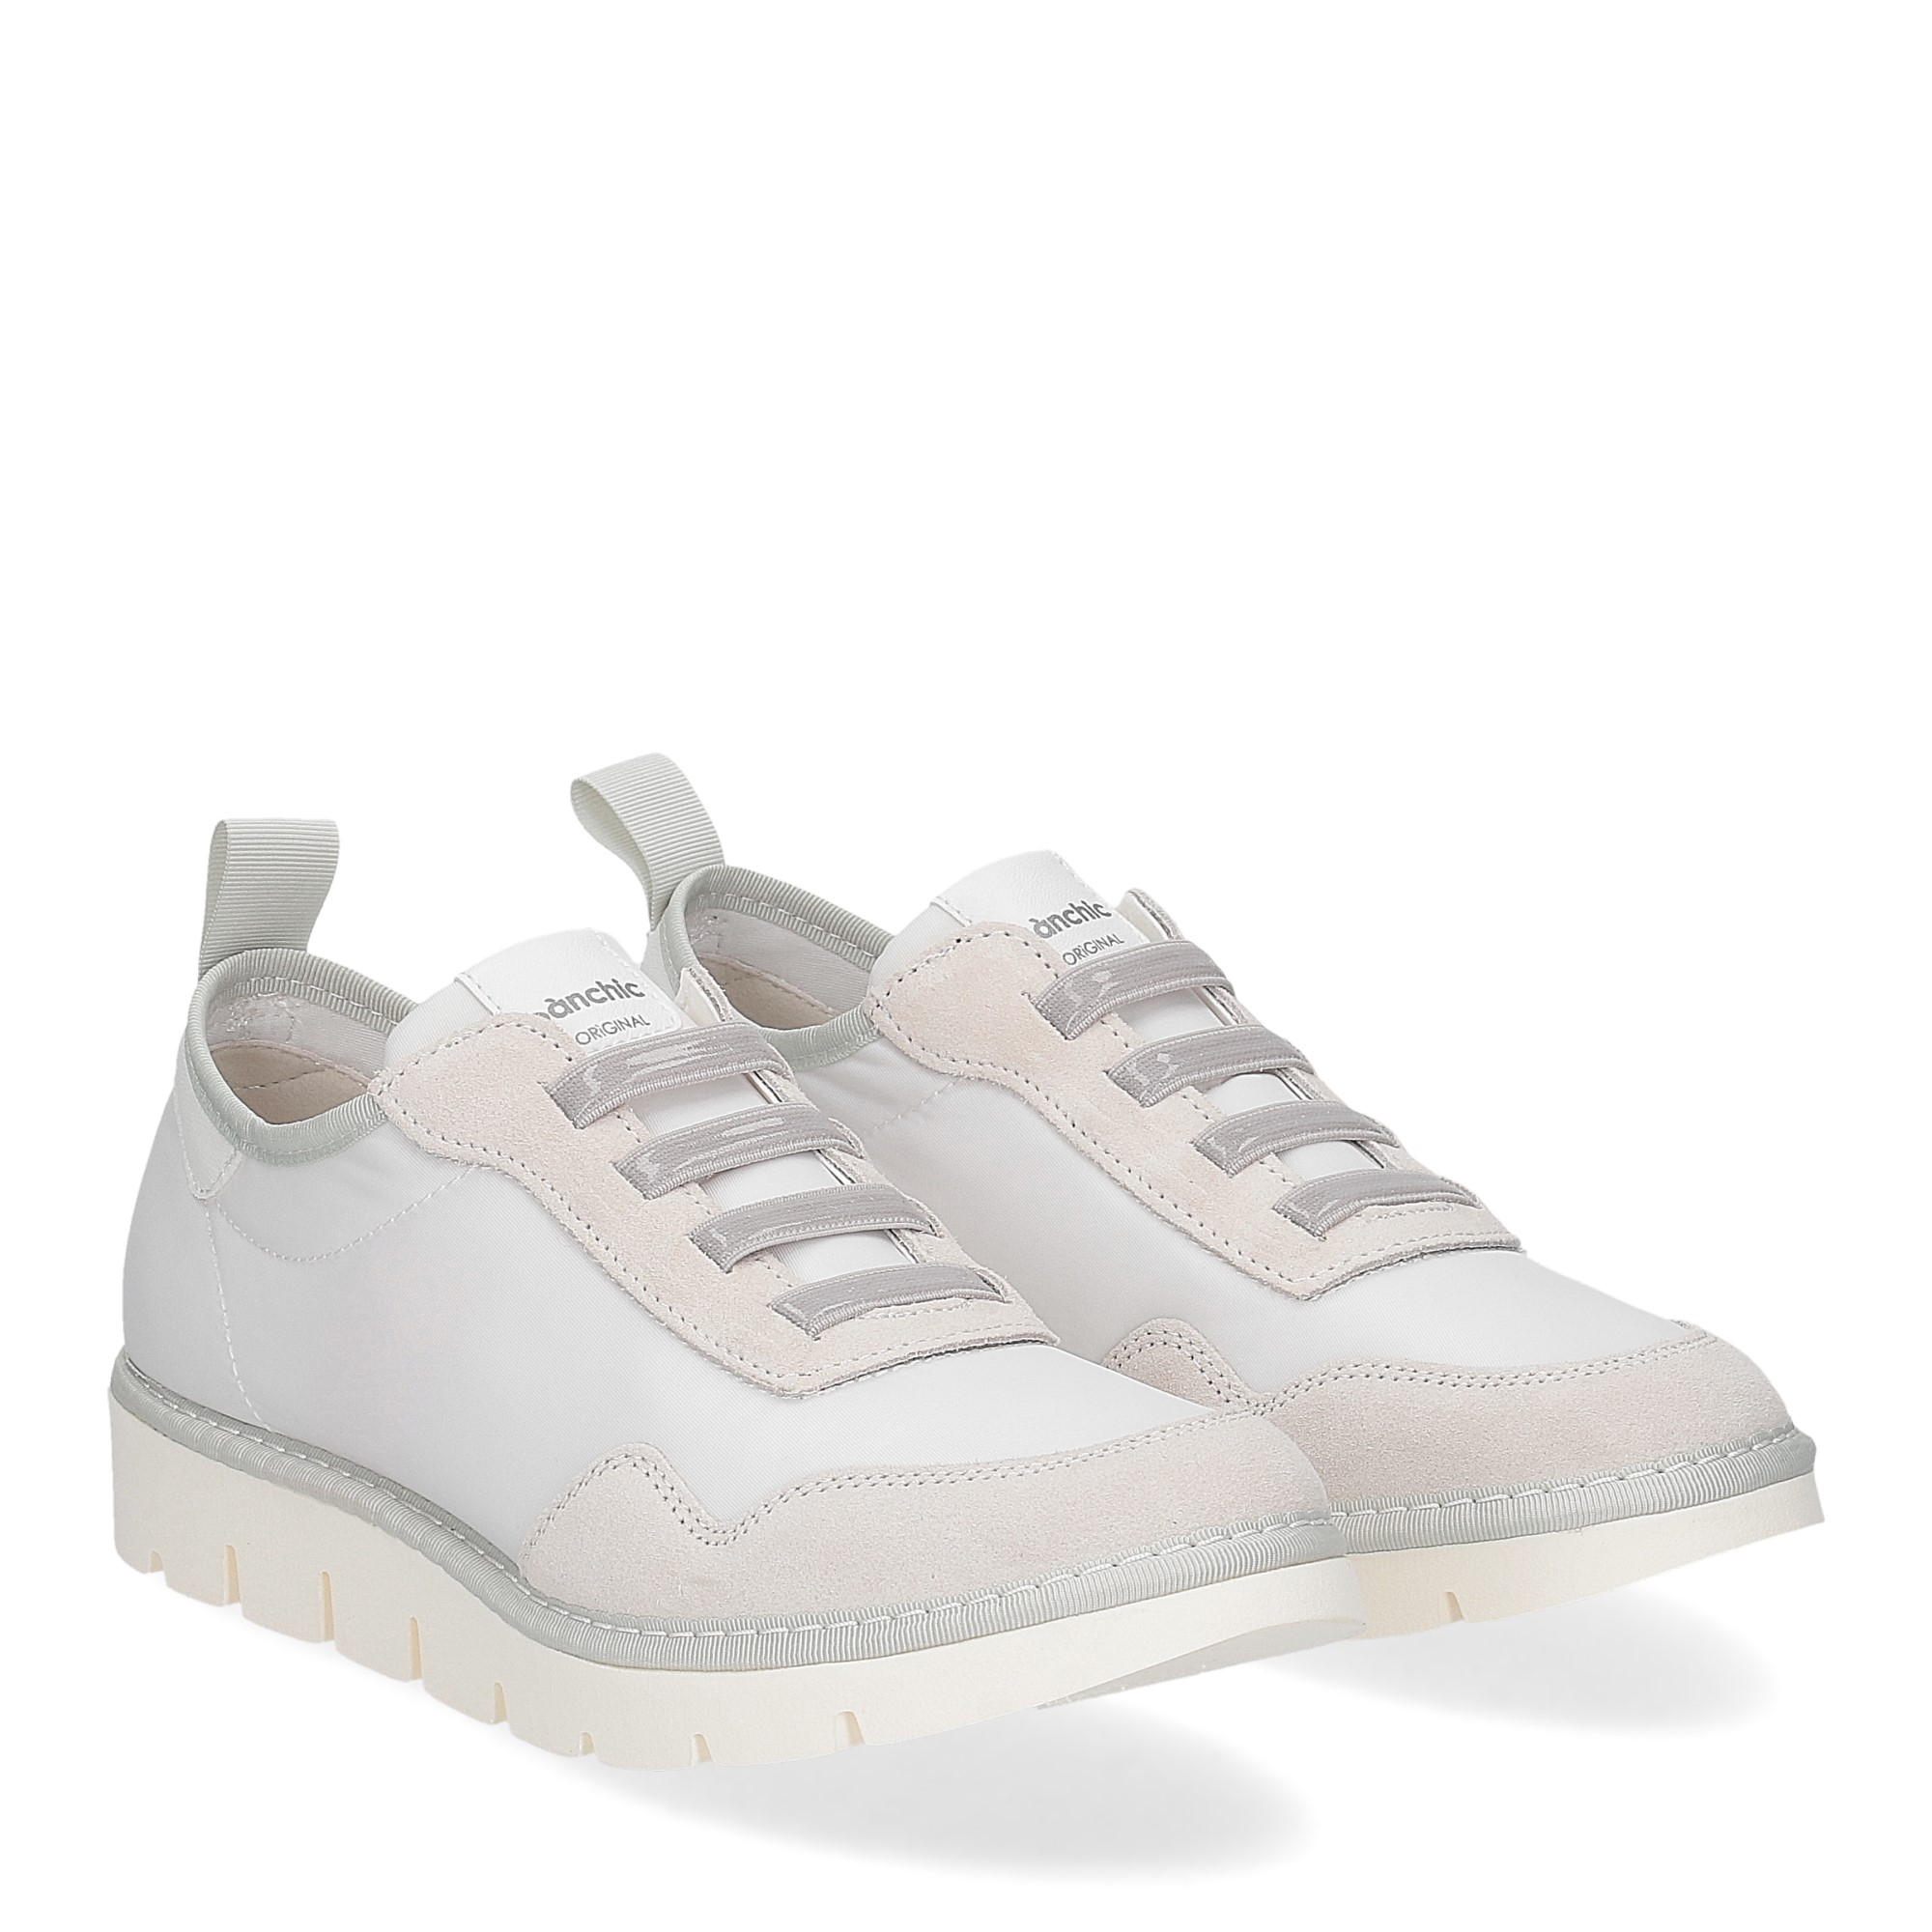 Panchic P05W nylon suede white